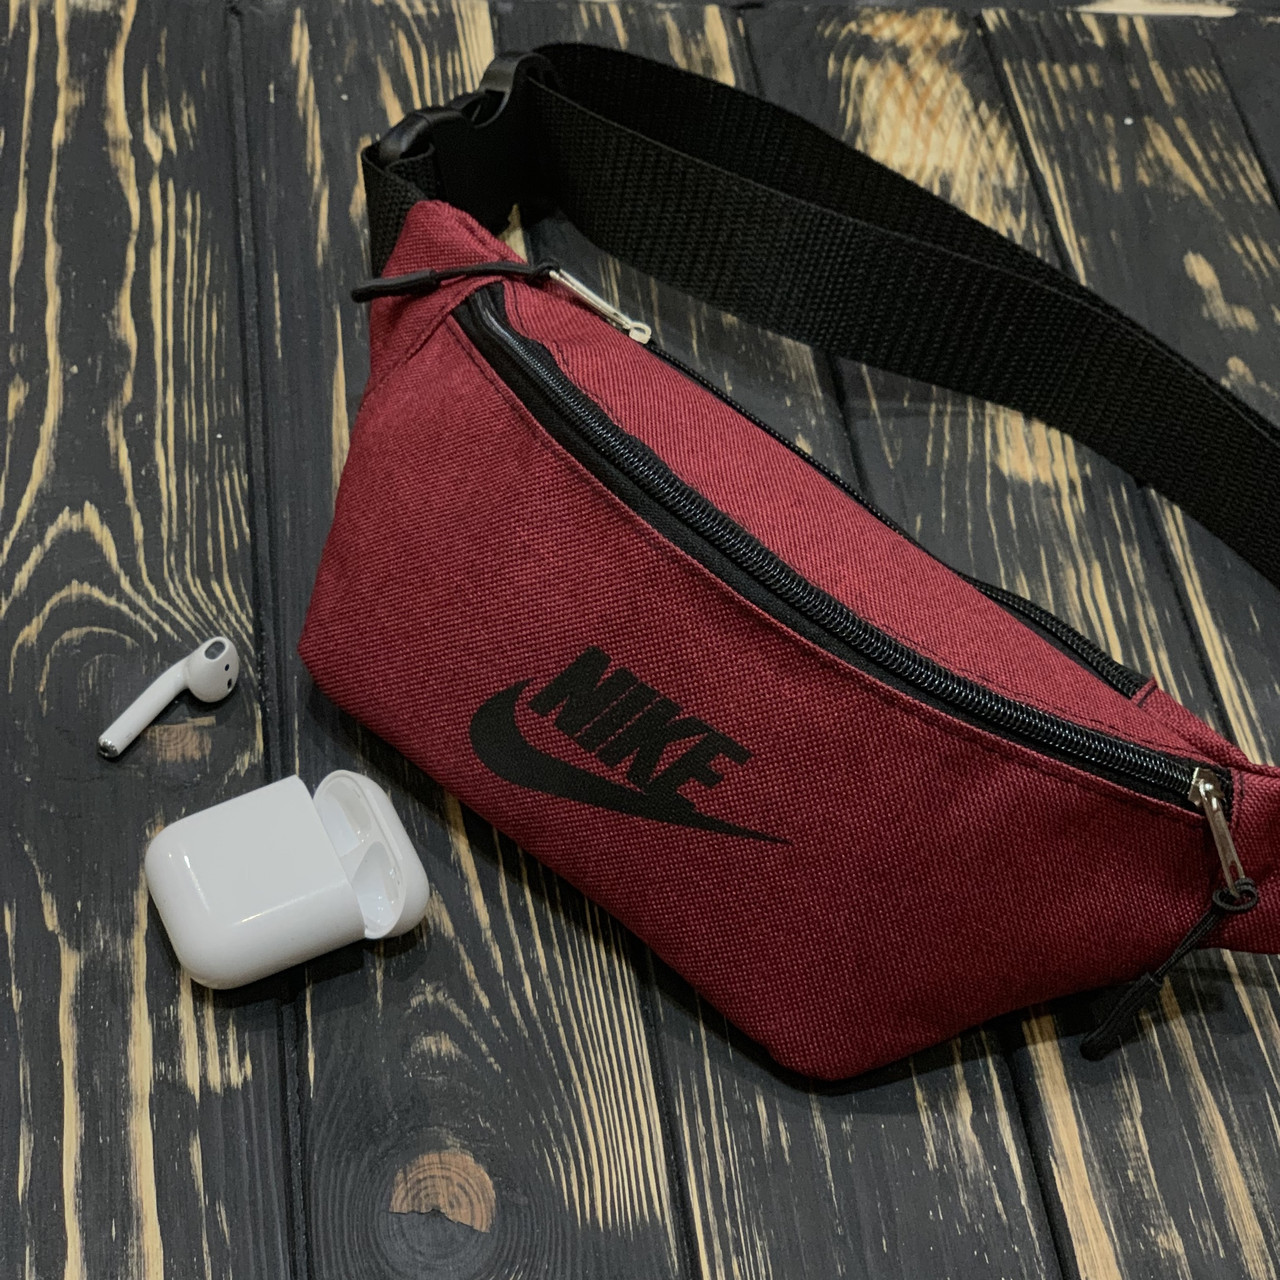 16edf460 Поясная сумка, бананка, сумка на пояс Nike, цвет красный, материал Kiten